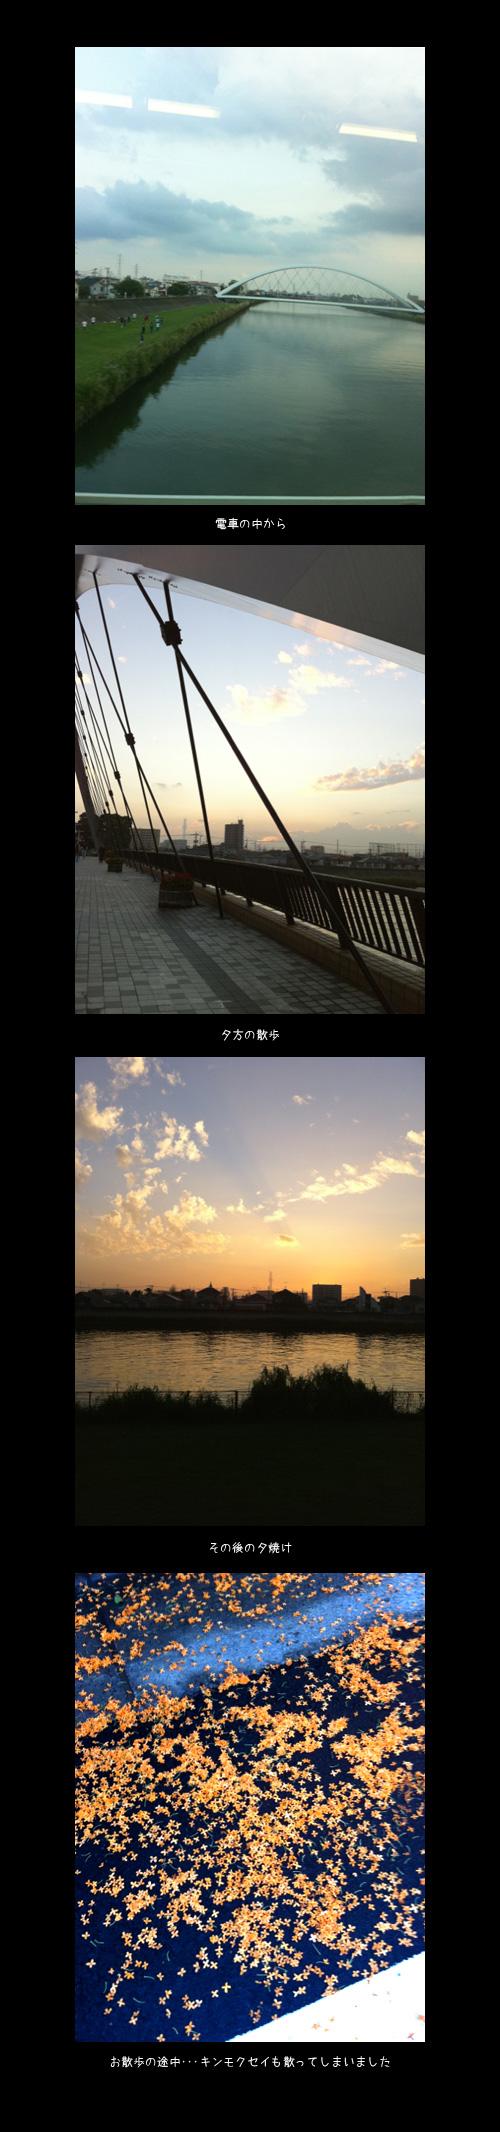 10月13日iphone1